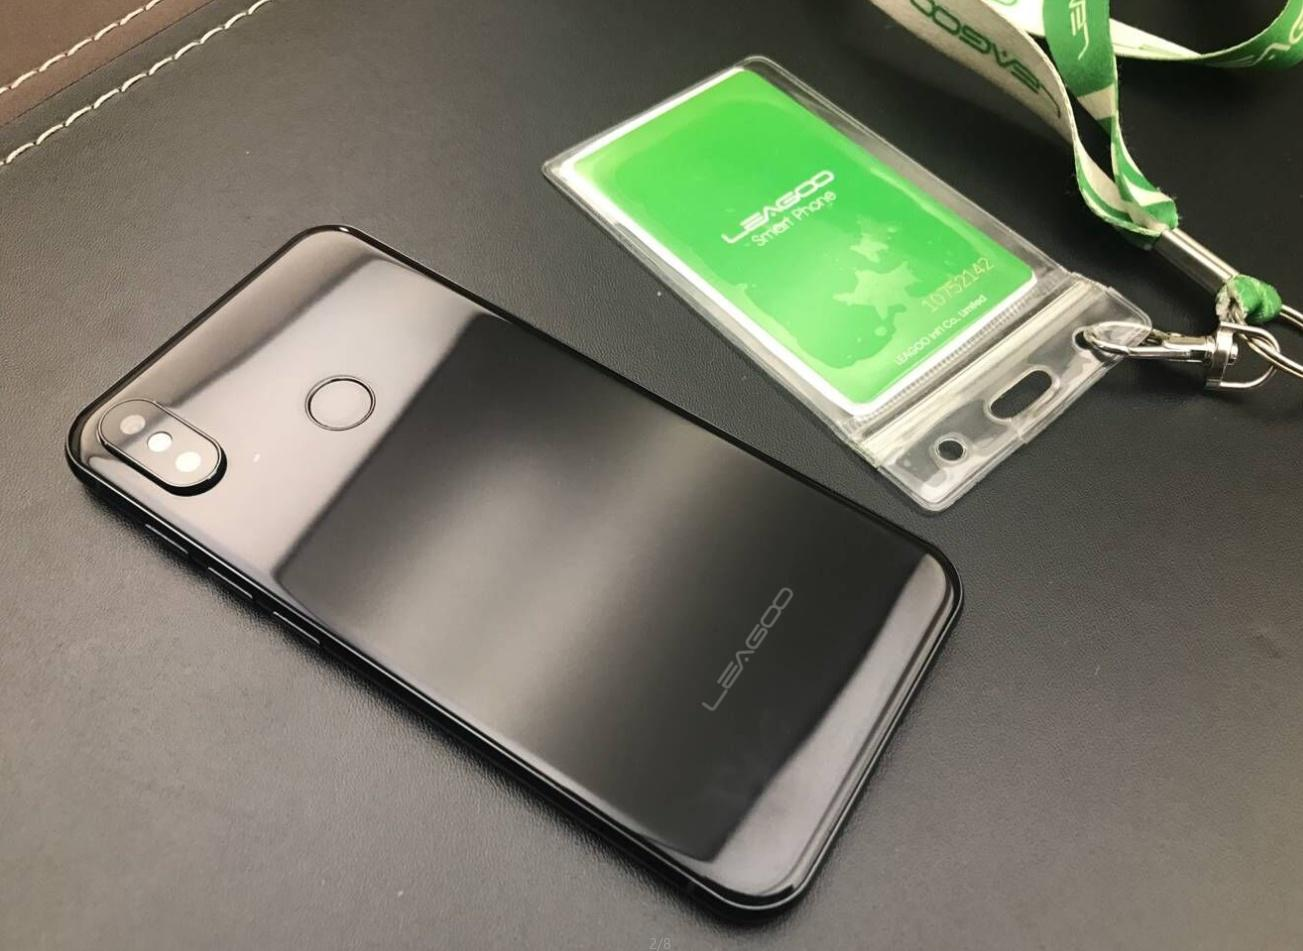 Leagoo S9 clon iPhone X